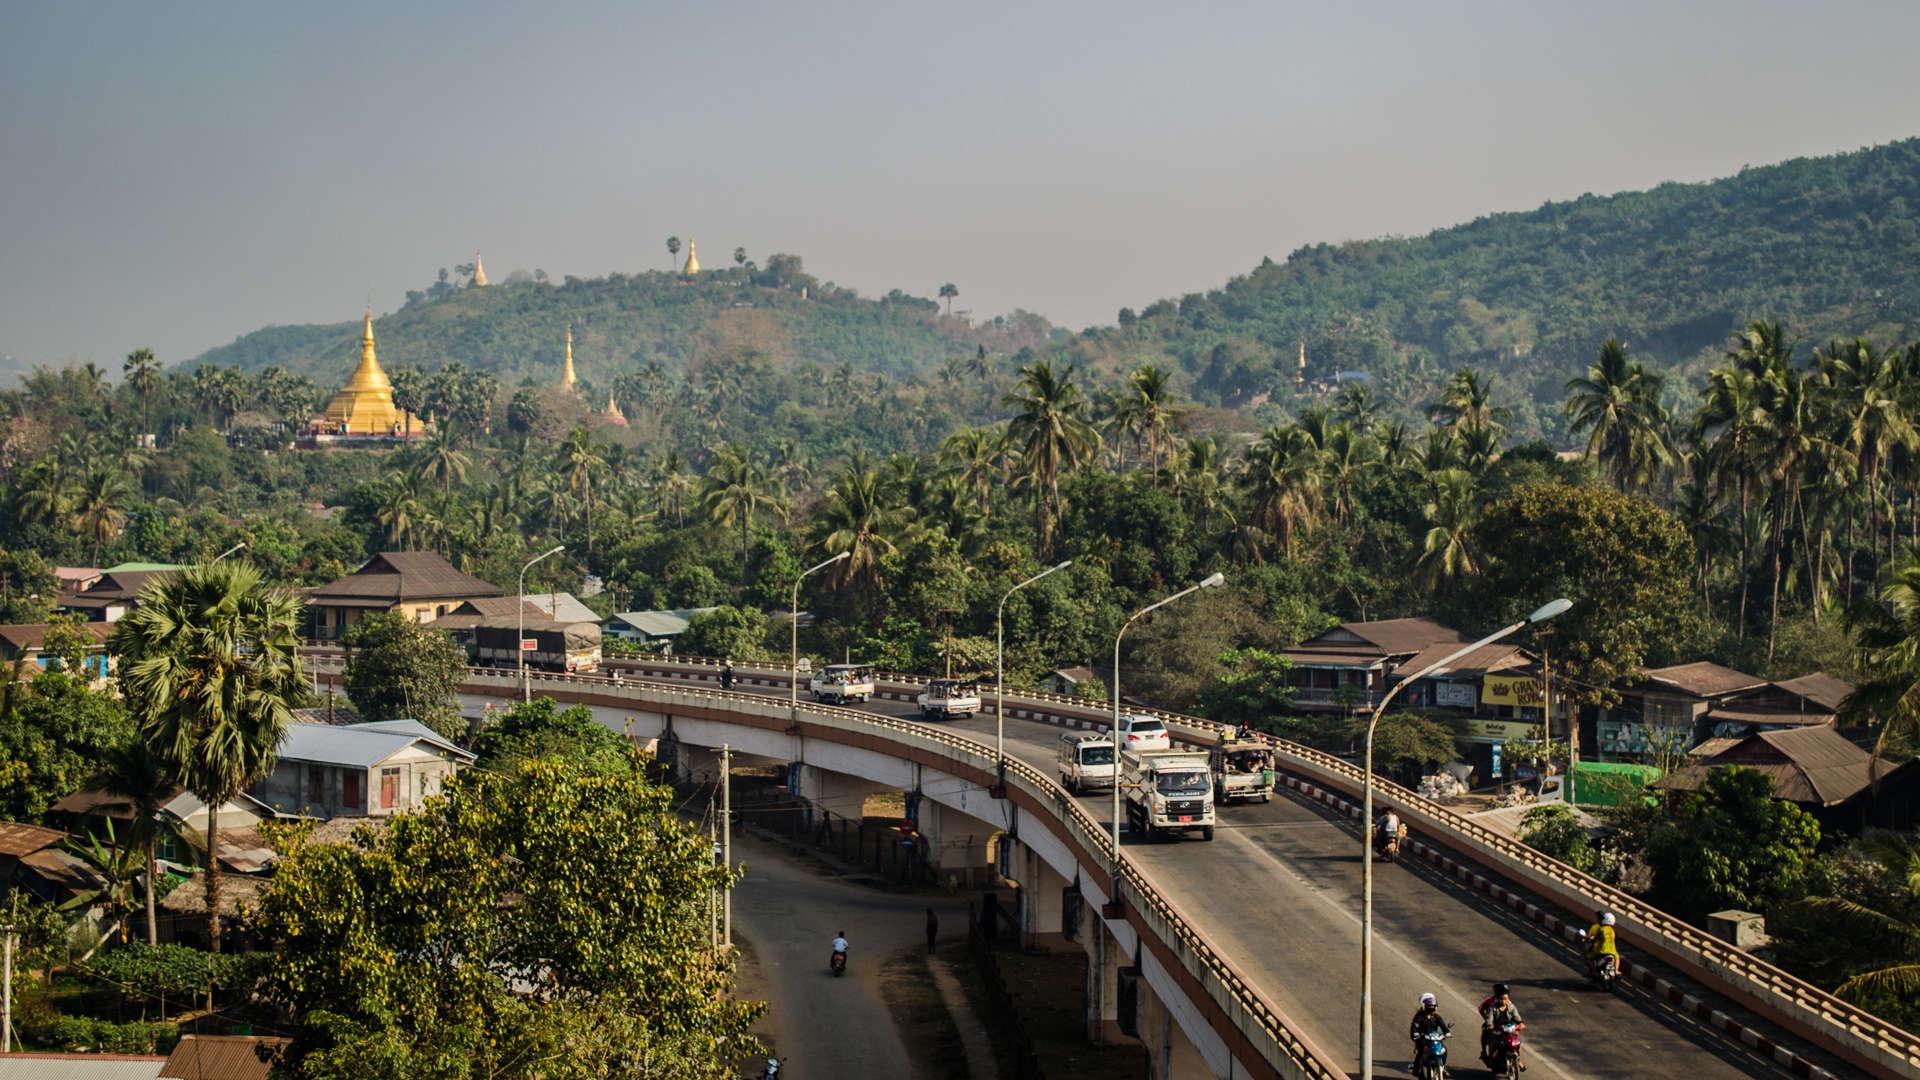 myanmar, burma, typical myanmar, temples myanmar, travel myanmar, many temples myanmar, temples, buddhist temples, budhist temples